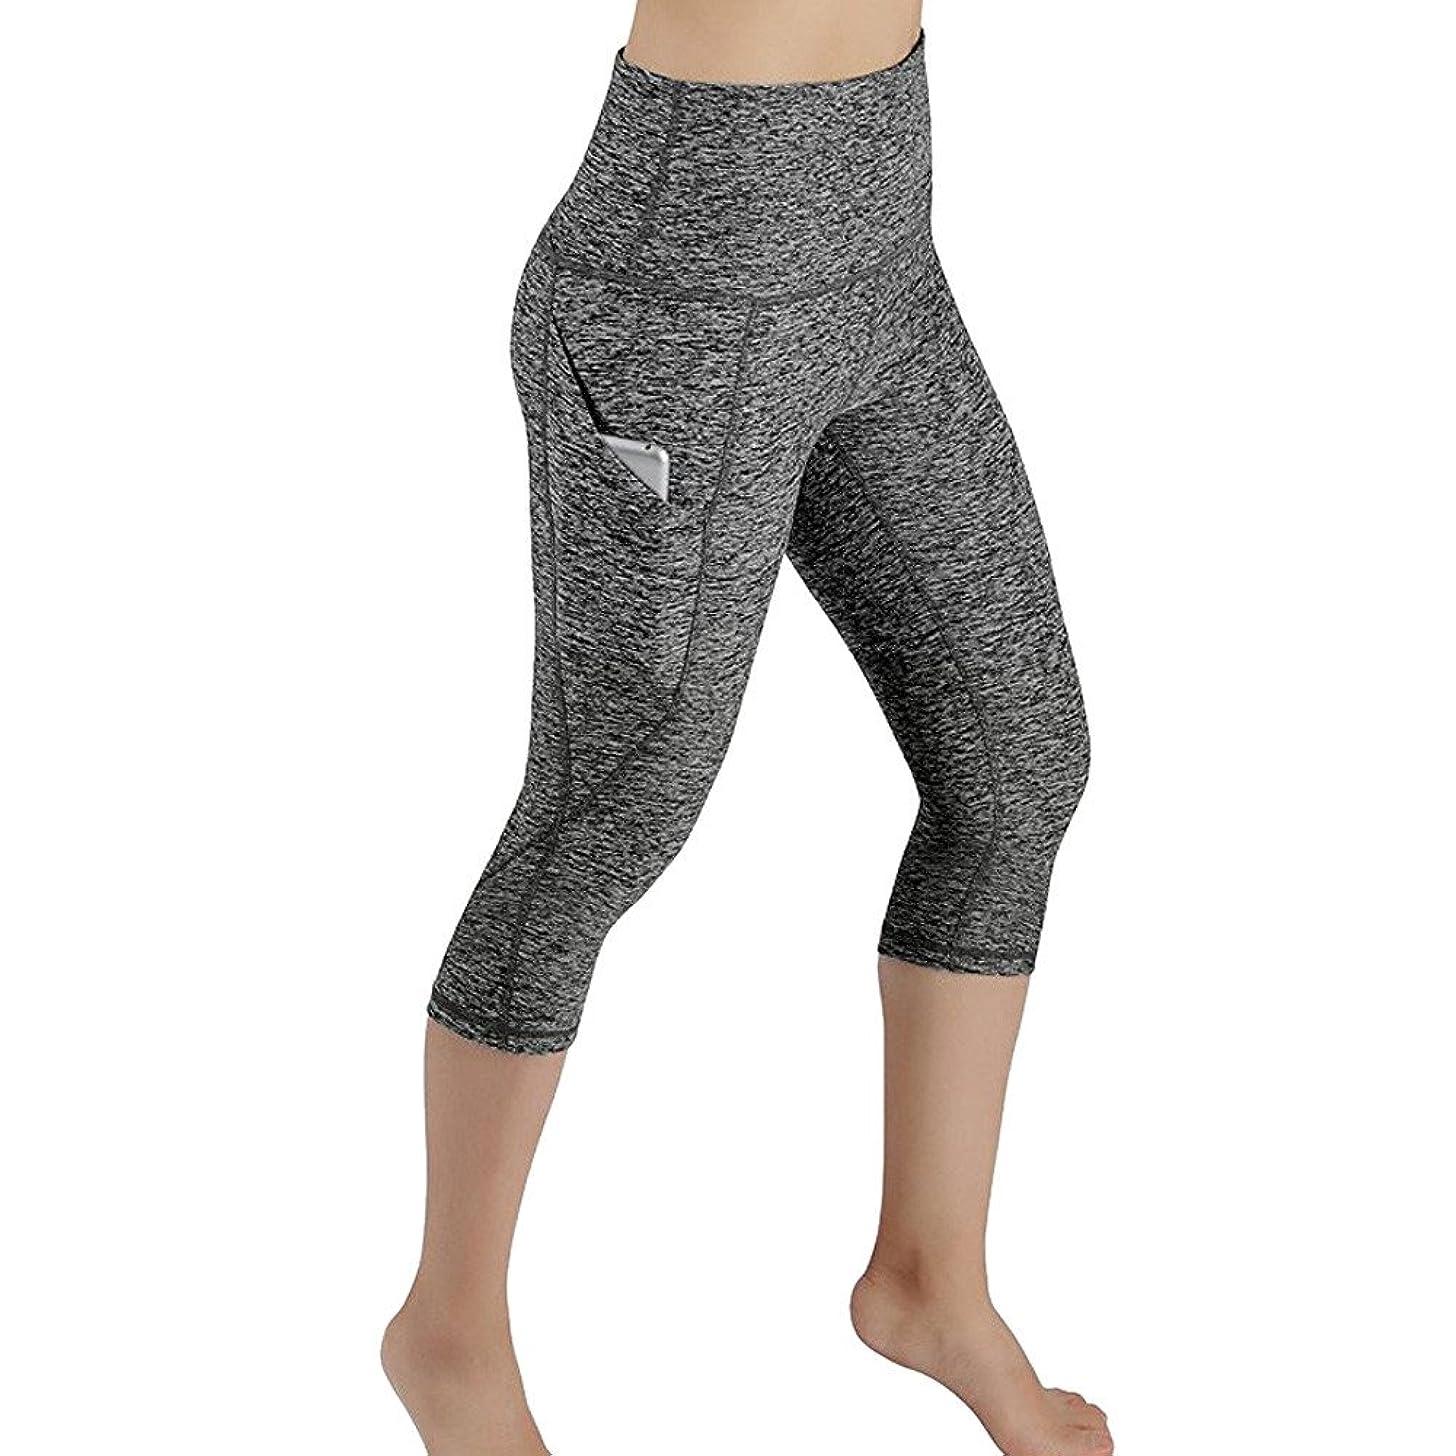 Yoga Pants for Women Gibobby Womens High Waist Yoga Leggings Phone Pocket Sports Workout Yoga Fitness Leggings Calf Length